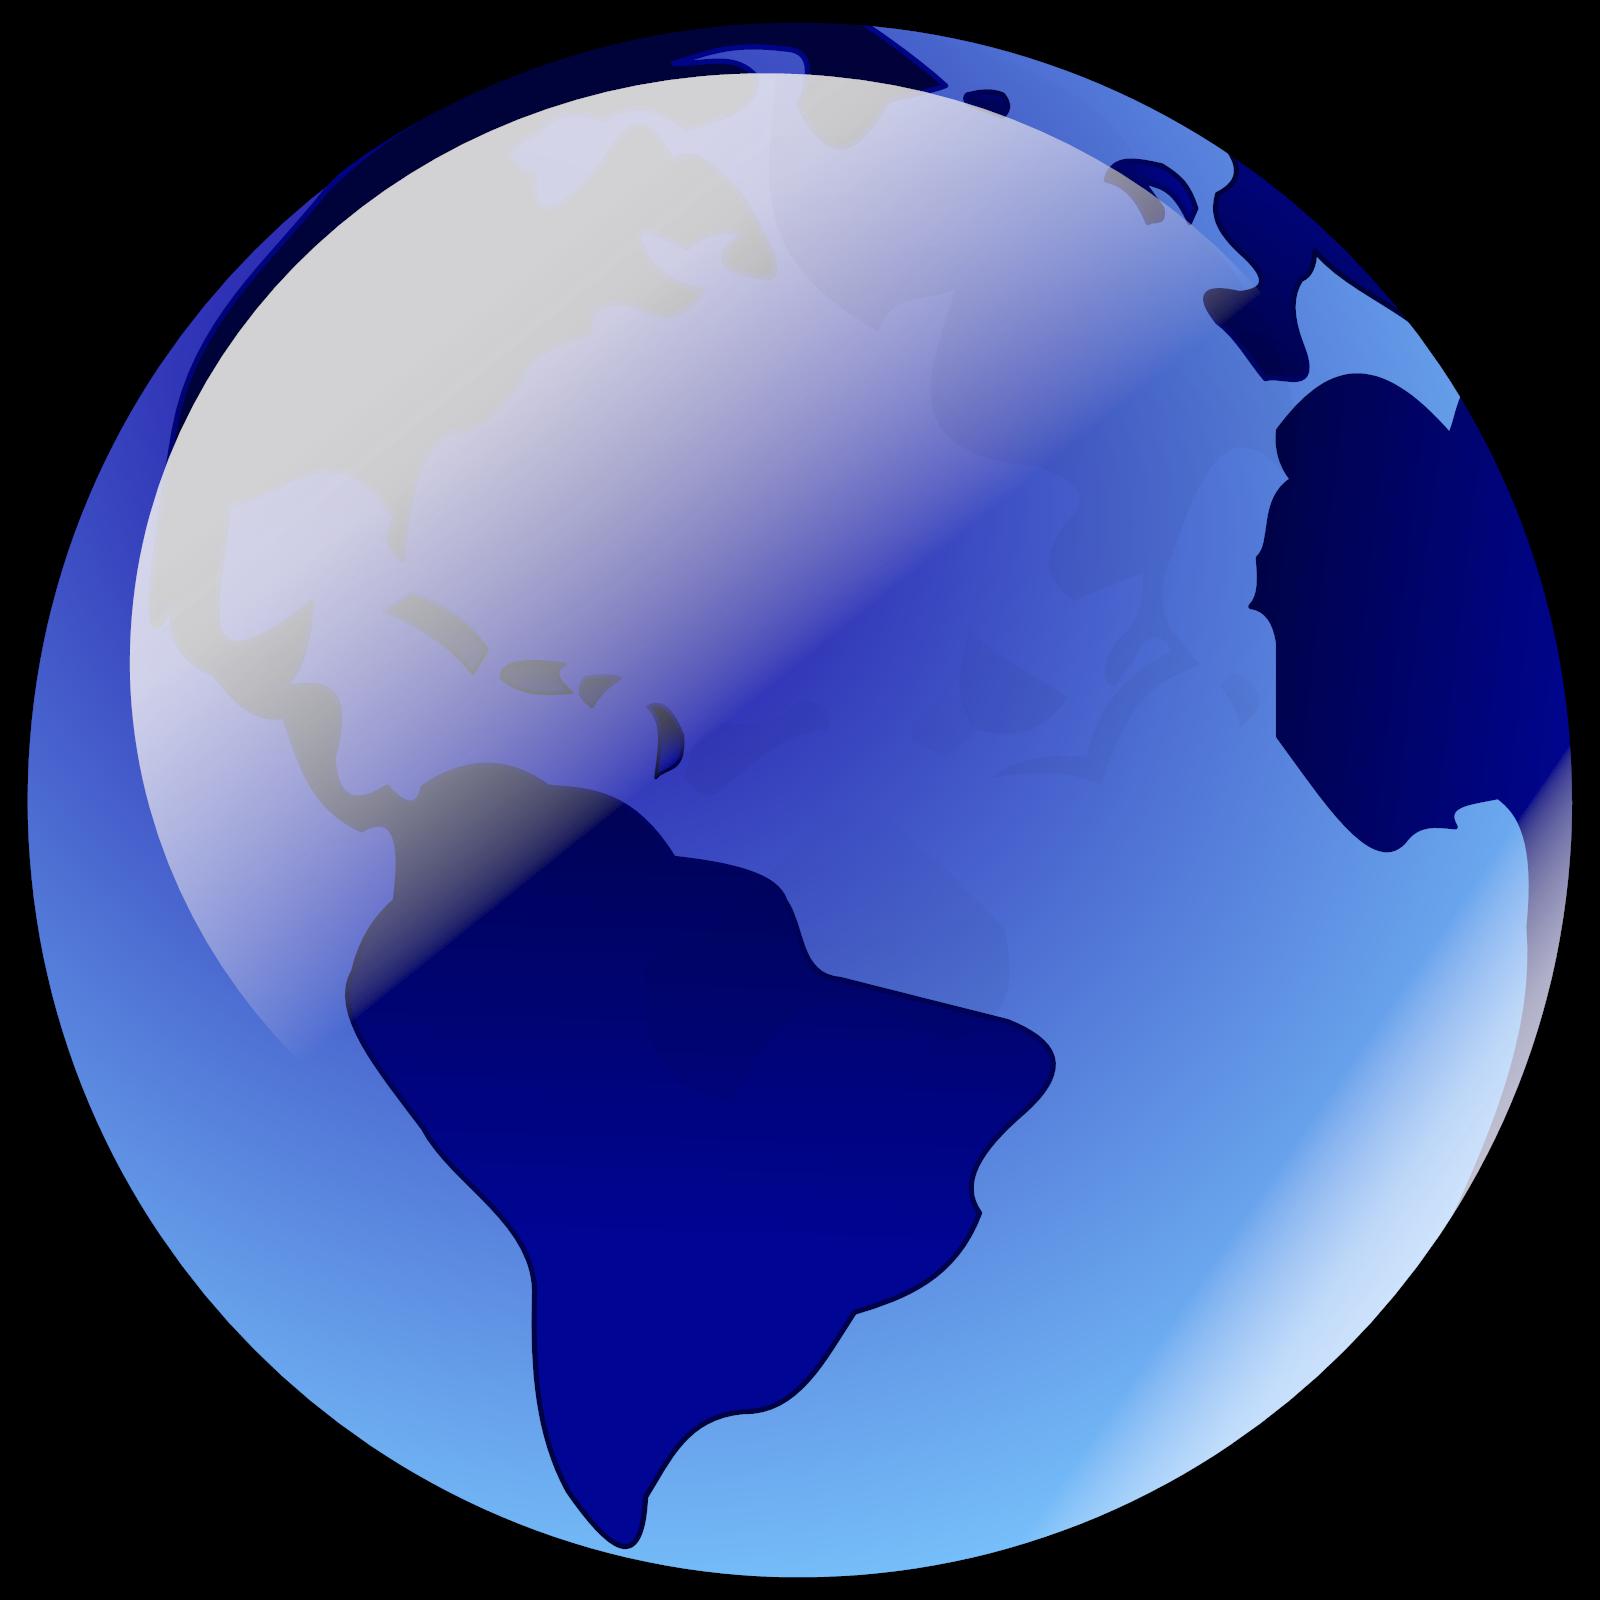 Blue Earth SVG Clip arts